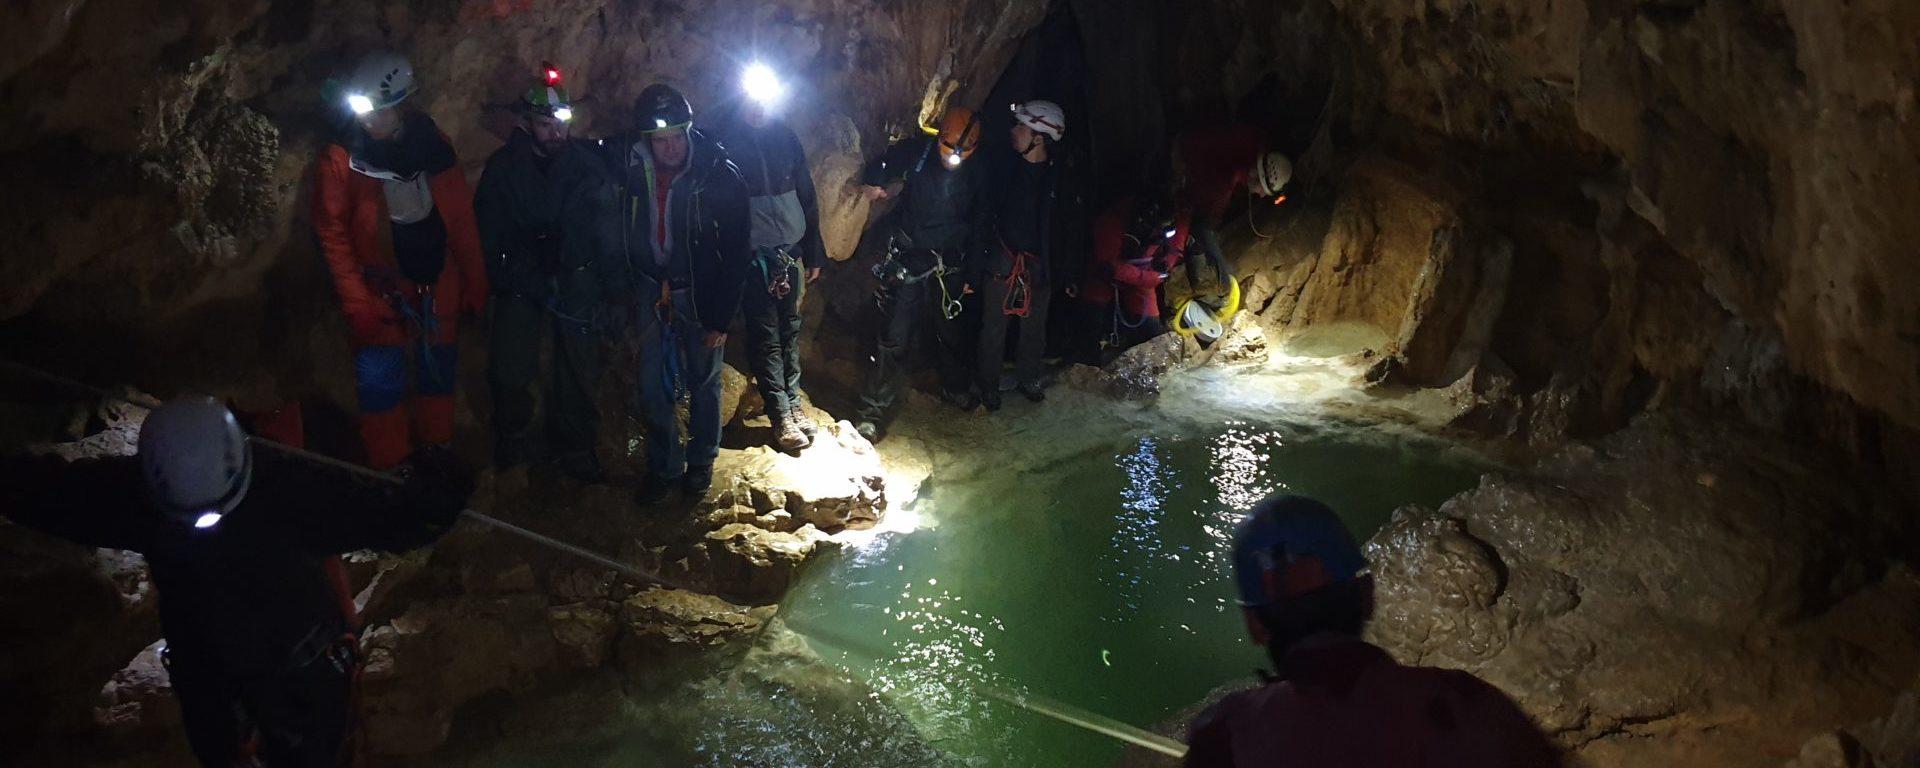 Visite de la grotte de Gournier.